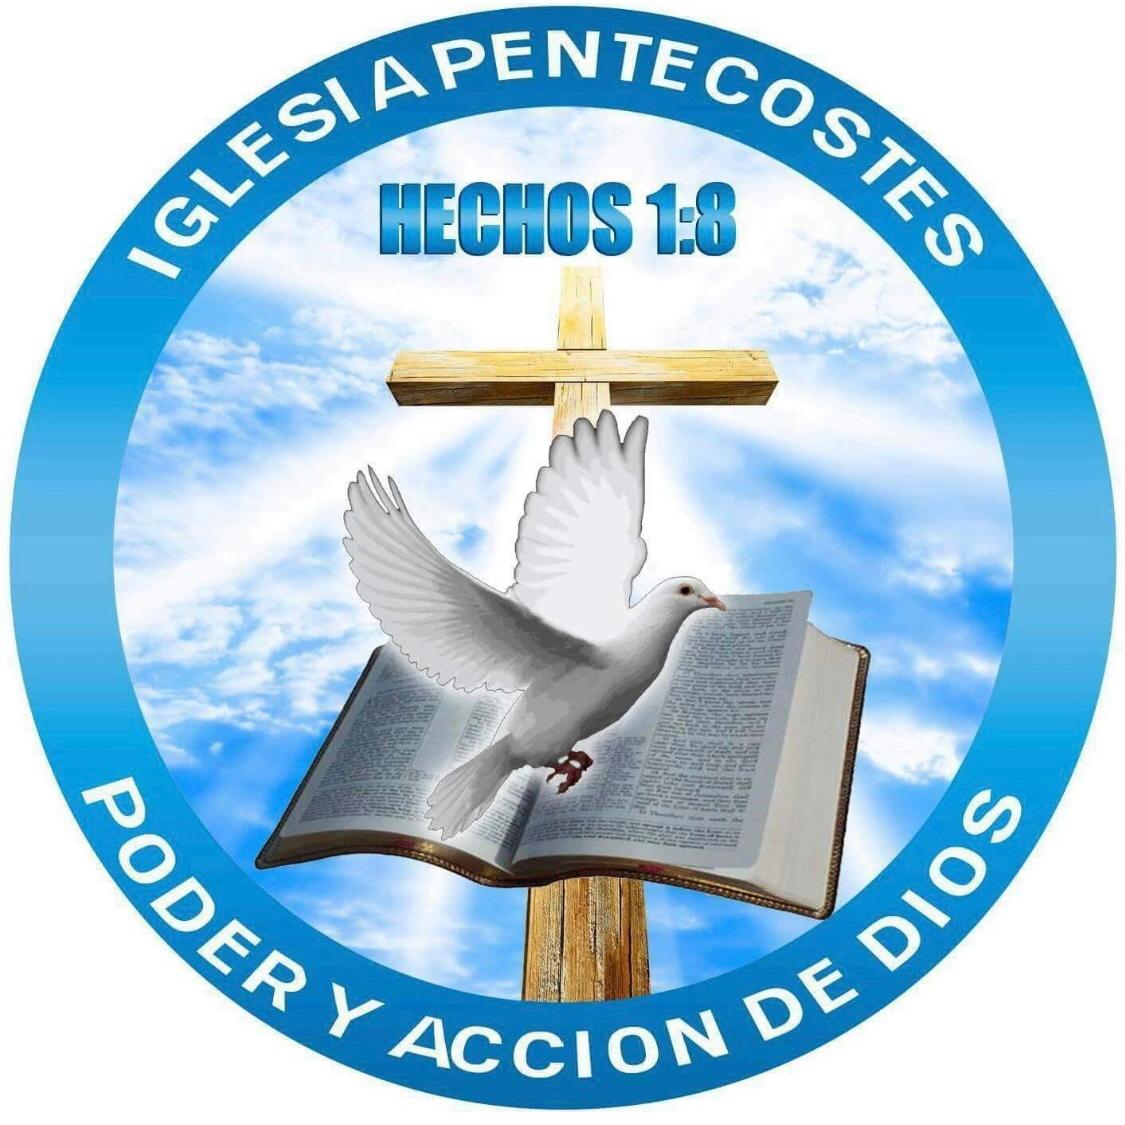 Iglesia Pentecostes Poder Y Acción De Dios Hechos 1:8